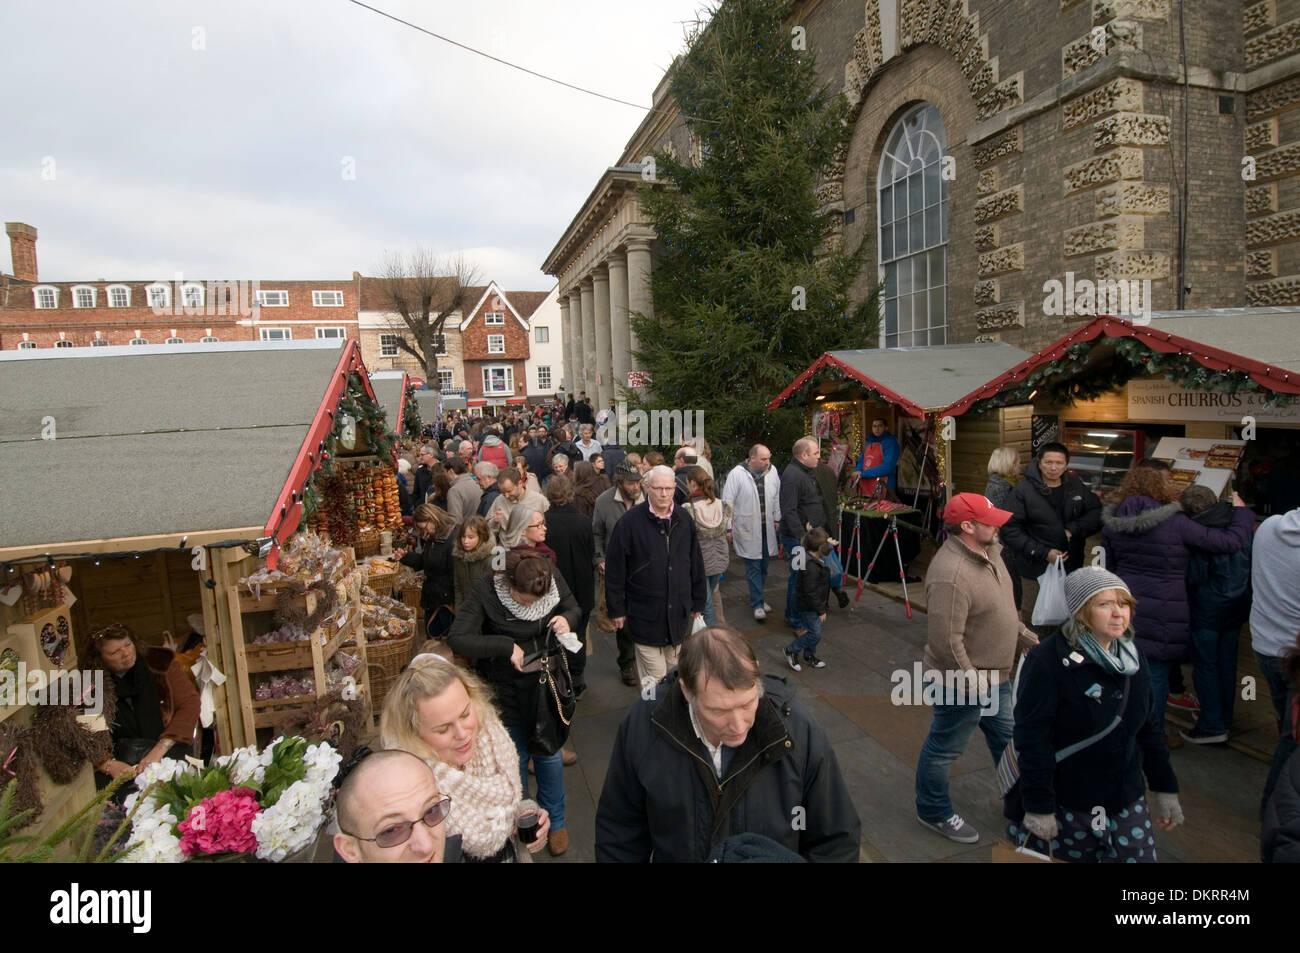 salisbury market square uk markets stall stalls holder holders food fresh fruit and veg vegetables vegetable busy town towns cen - Stock Image